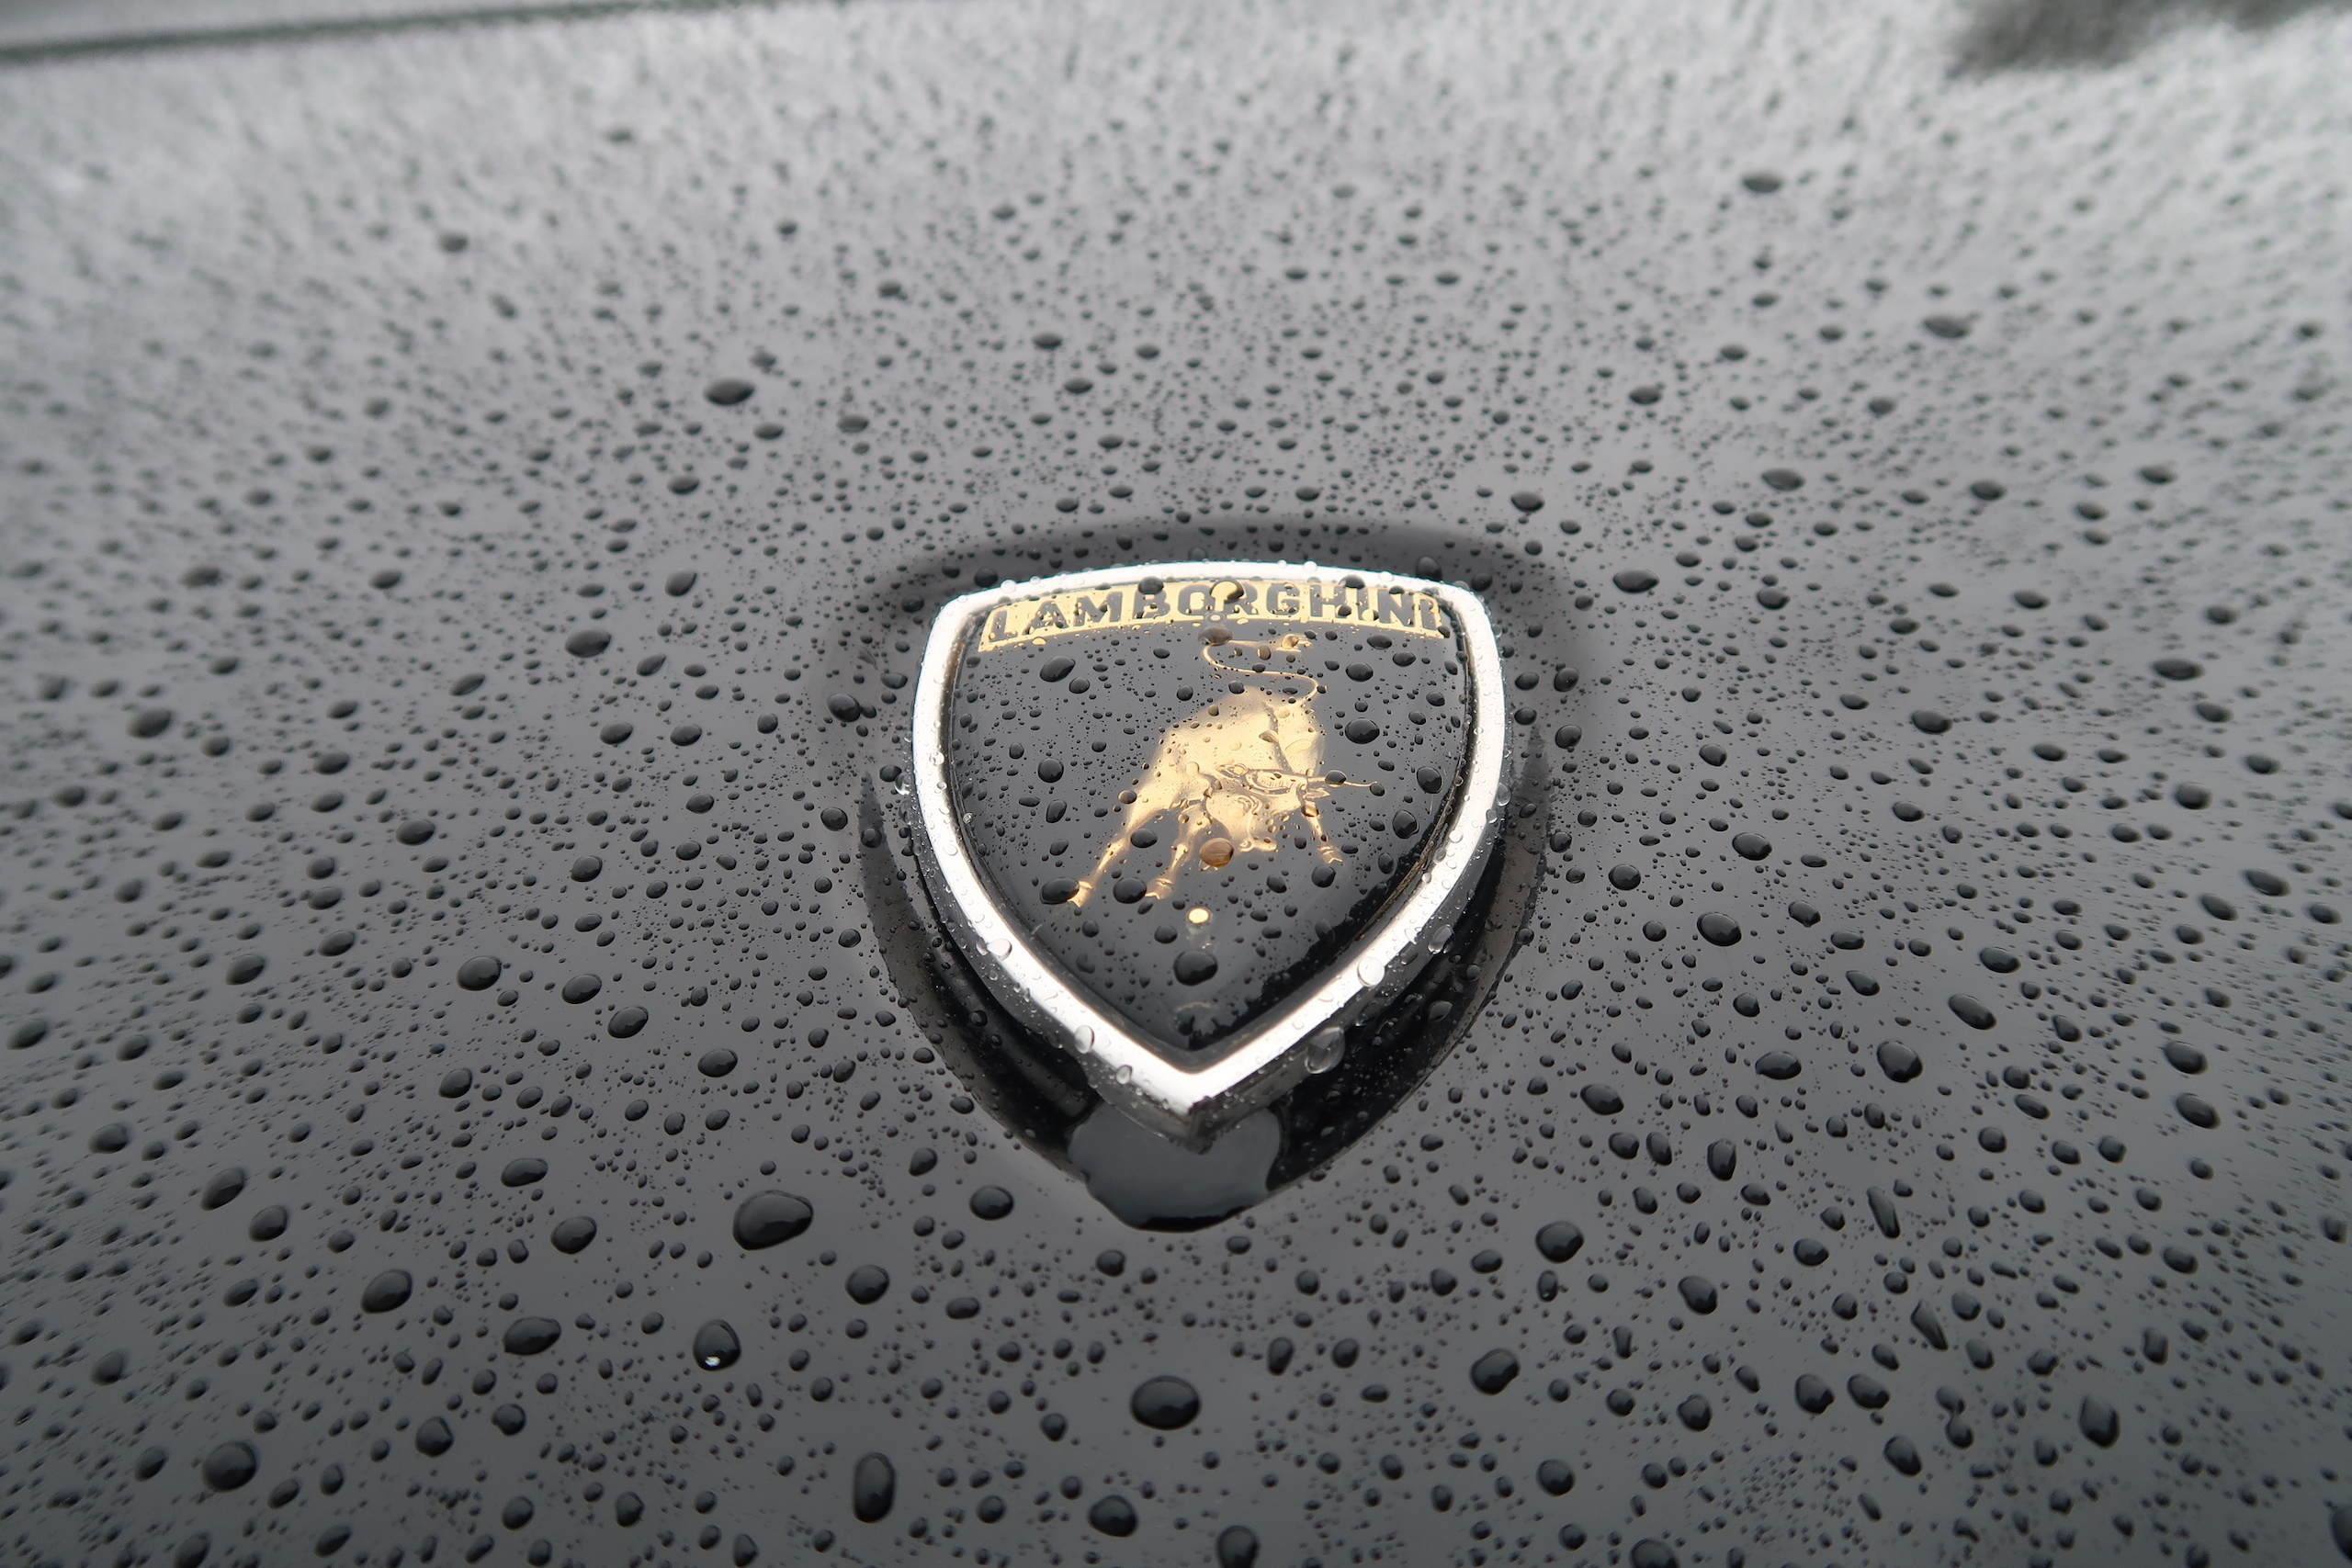 1986 Lamborghini Jalpa badge